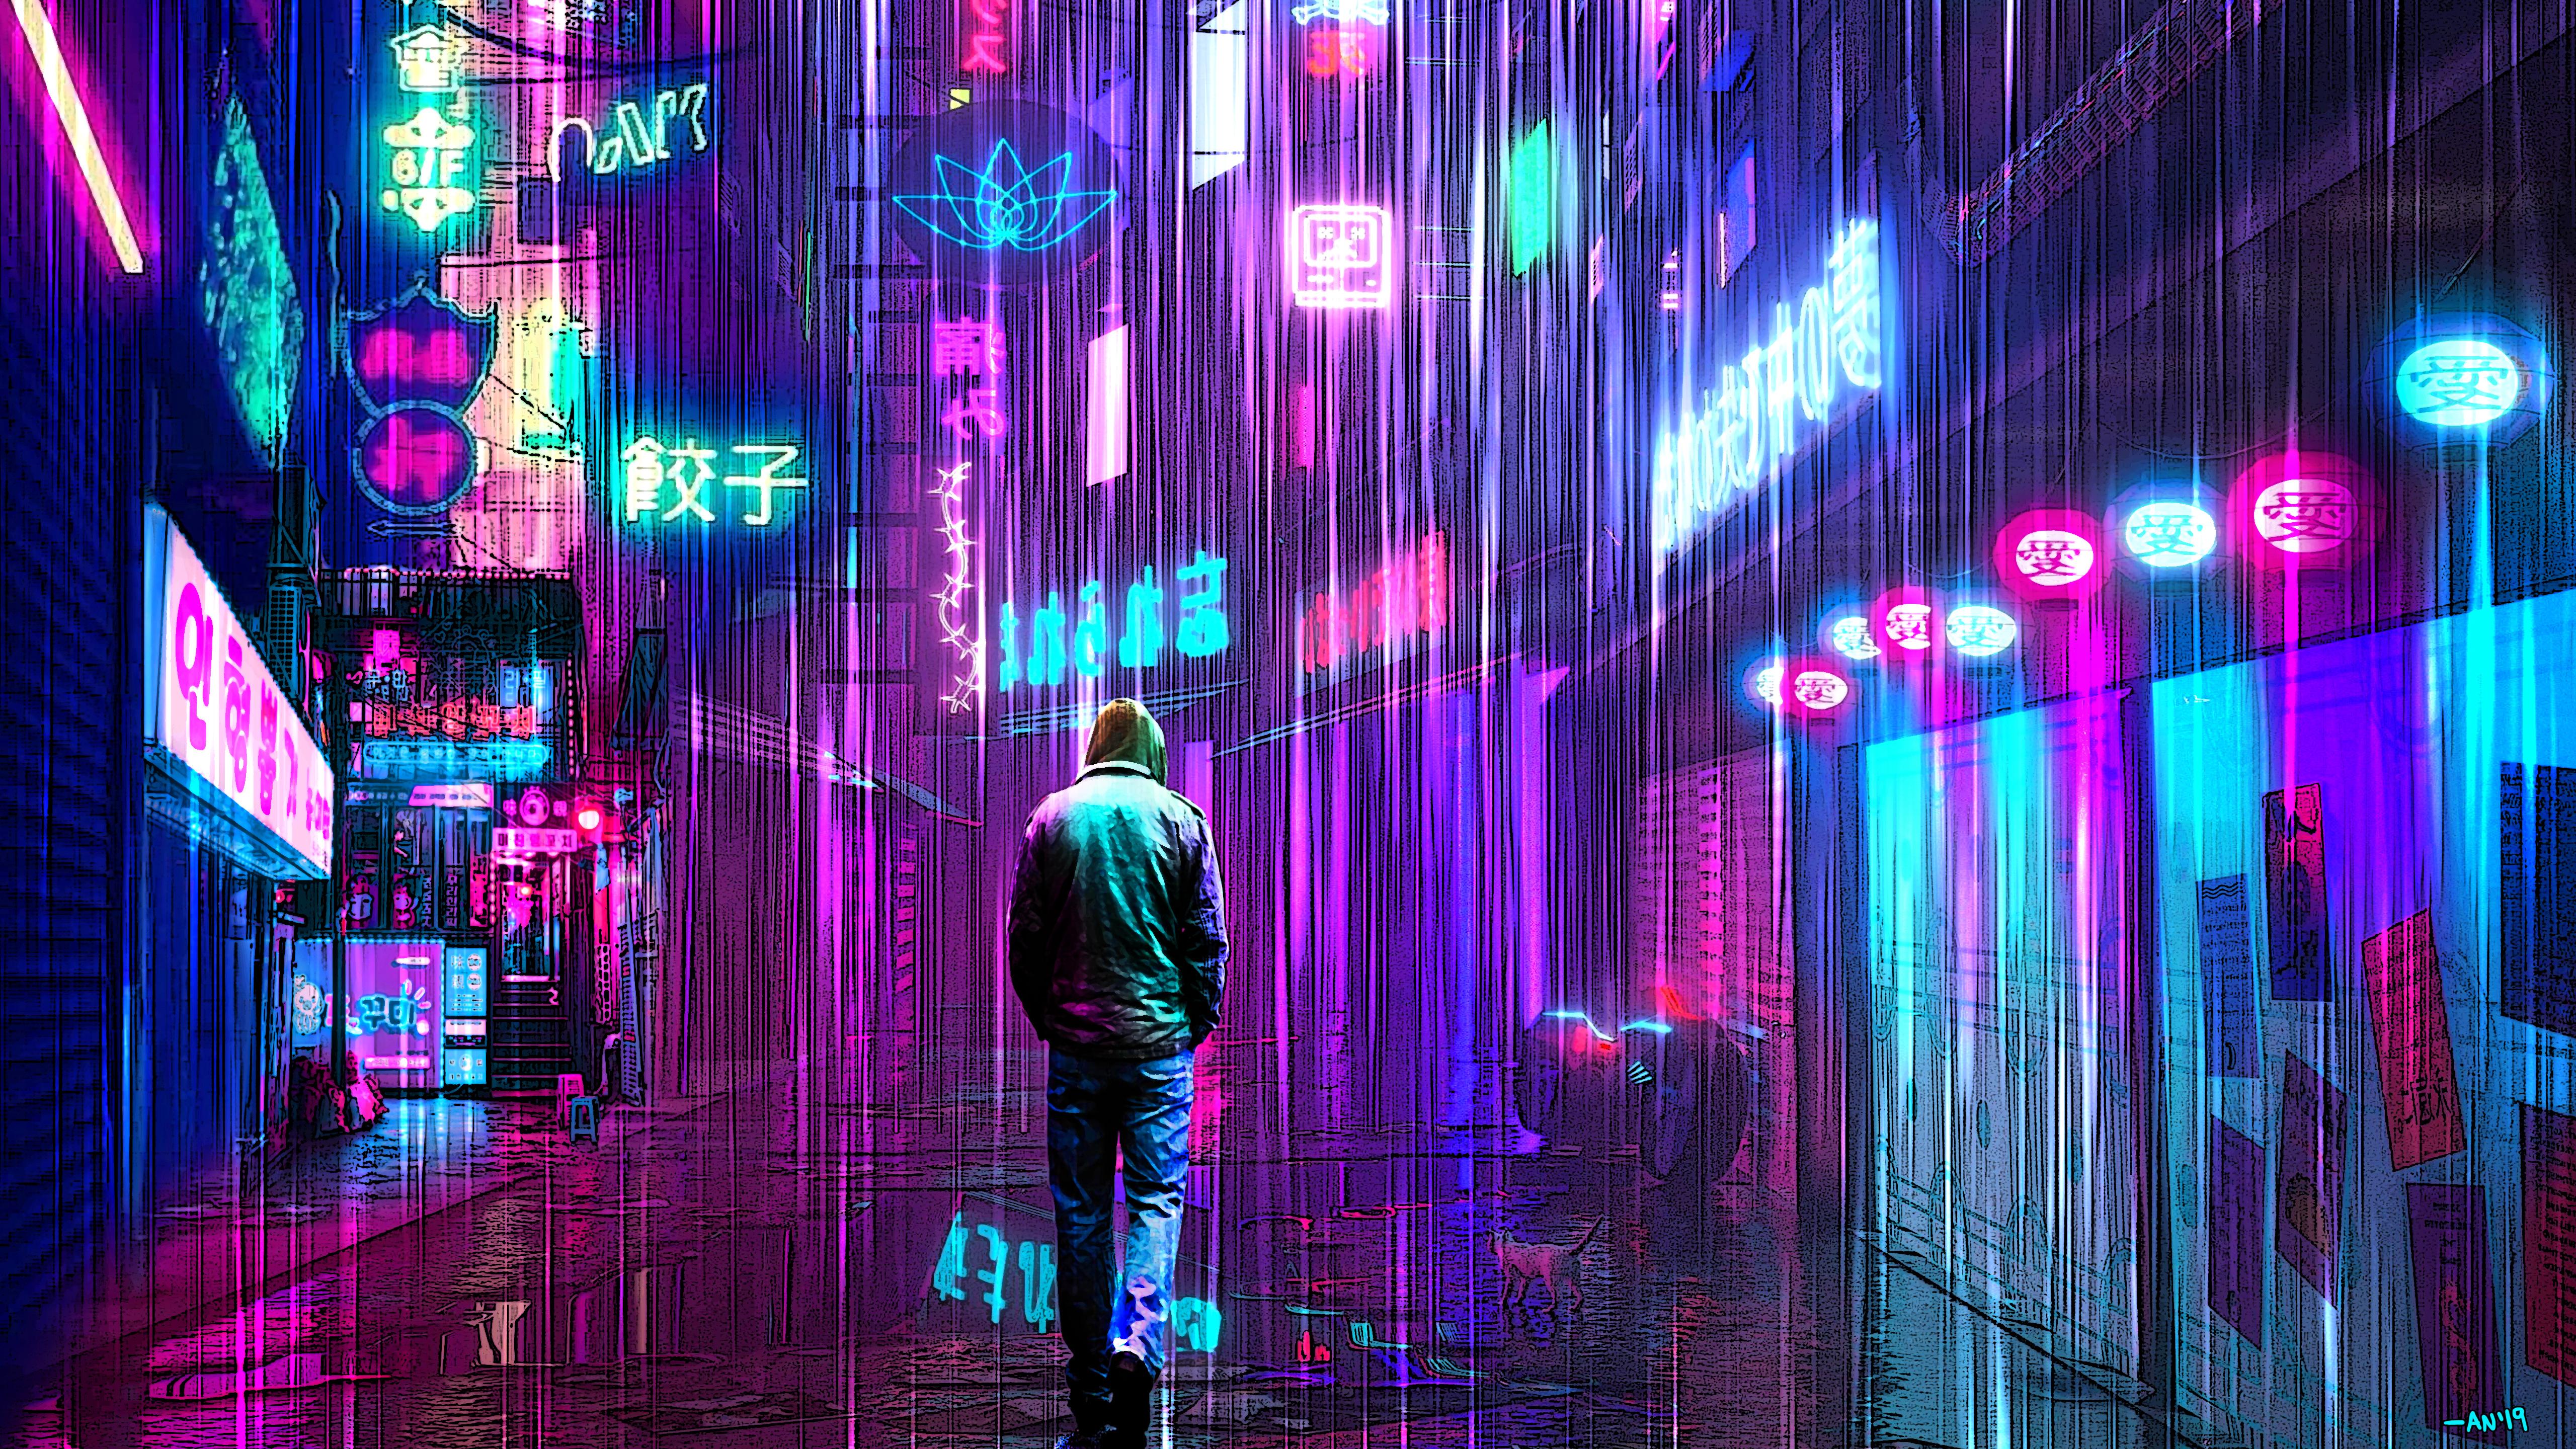 Wallpaper 4k Neon Rainy Lights Cyberpunk